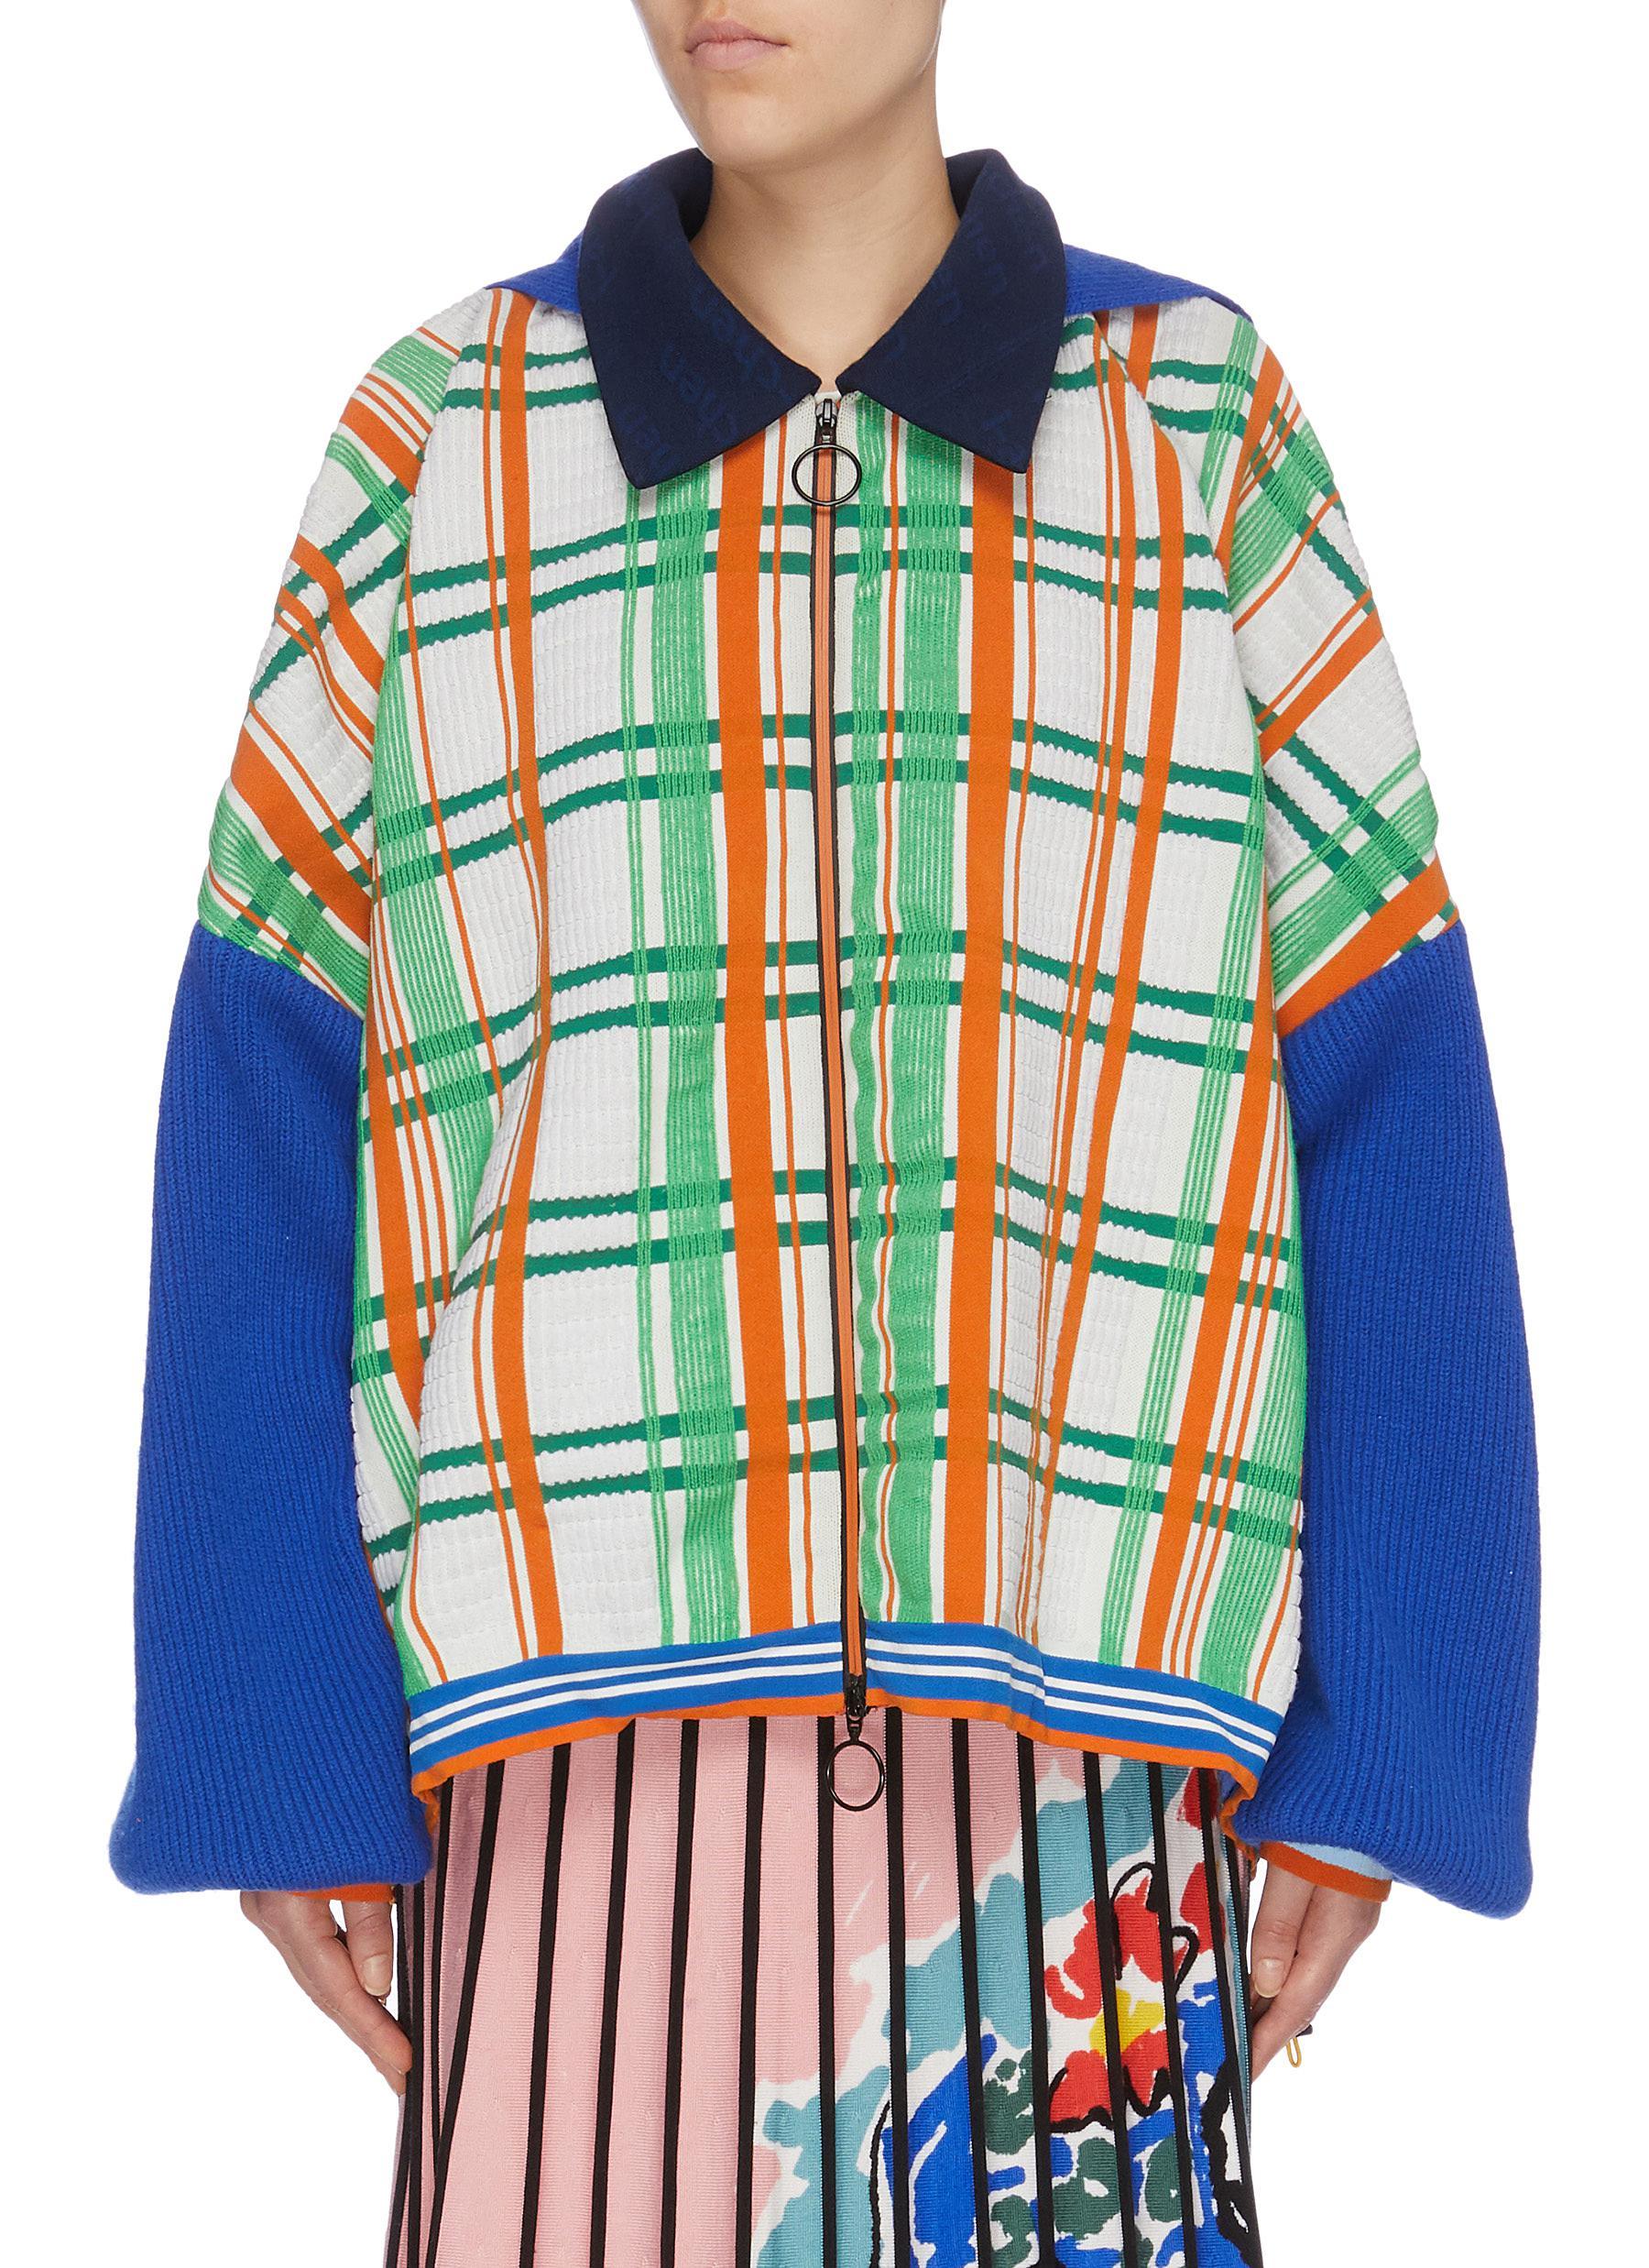 x Woolmark hooded colourblock sleeve check plaid knit jacket by I-Am-Chen